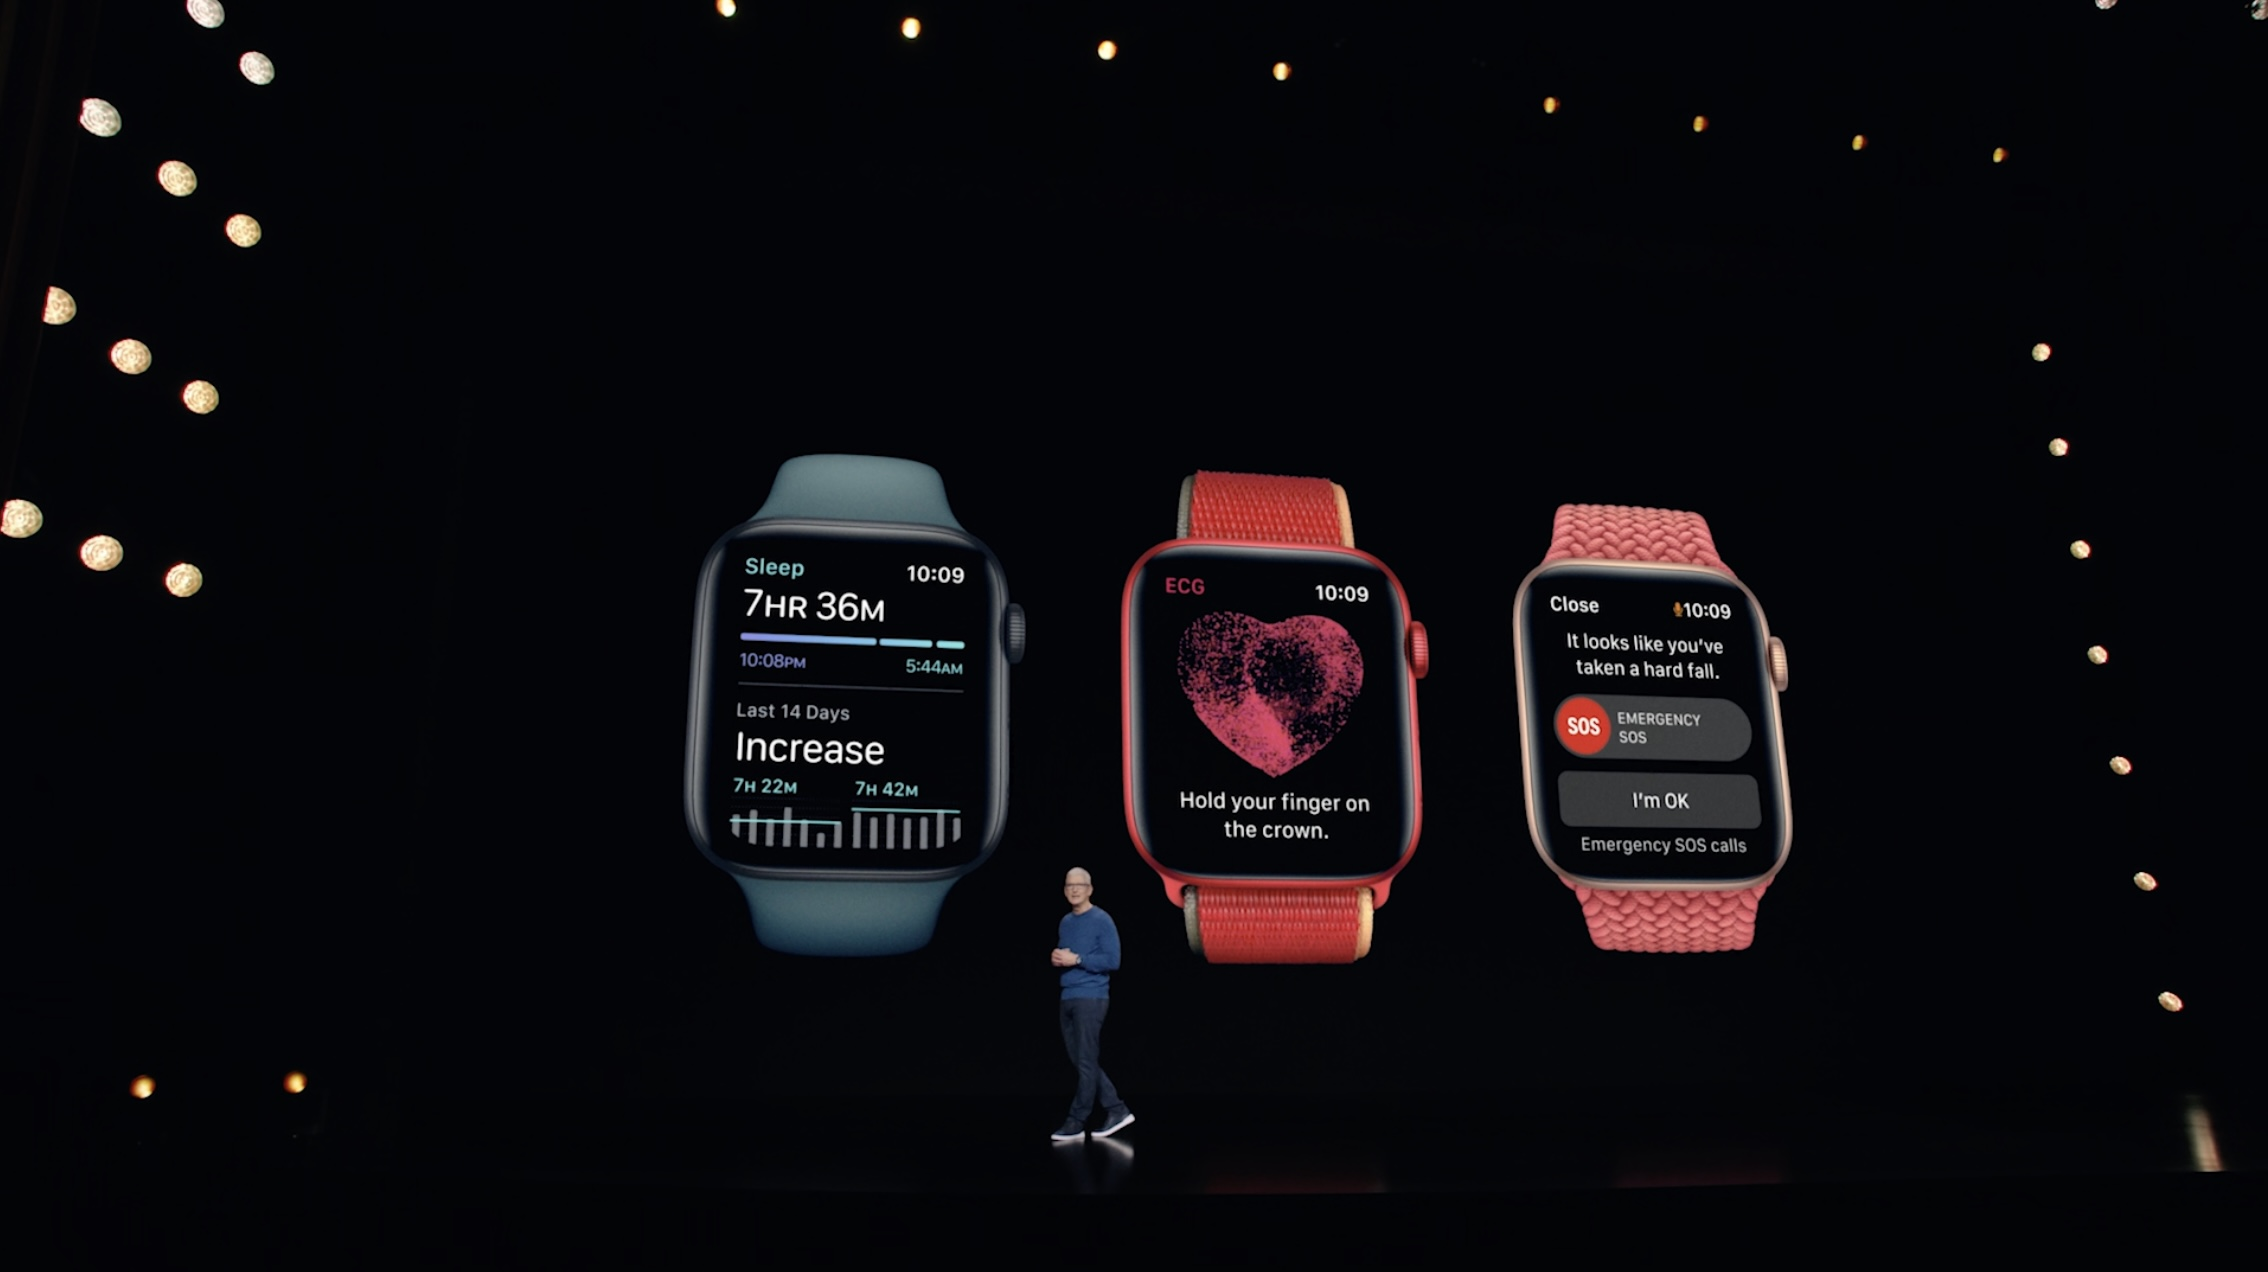 Apple Watch Series 7 comparison - Key features